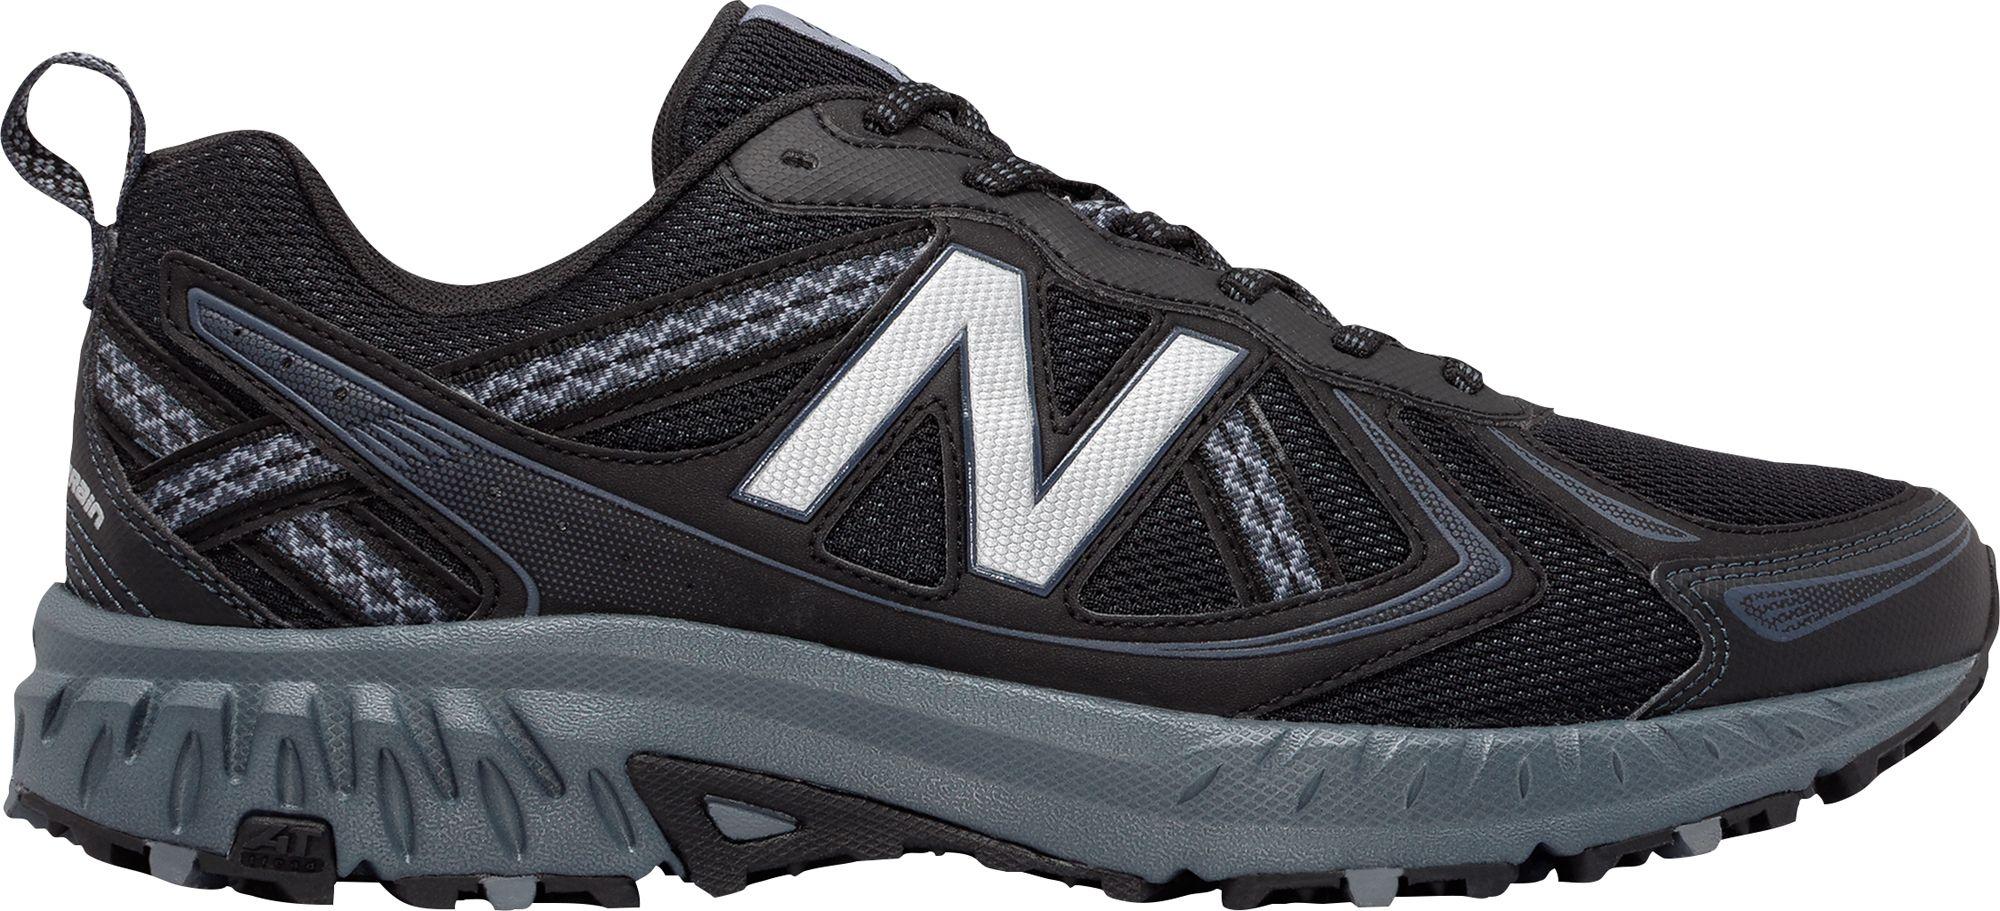 New Balance Men\u0027s 410v5 Trail Running Shoes. 0:00. 0:00 / 0:00.  noImageFound ???